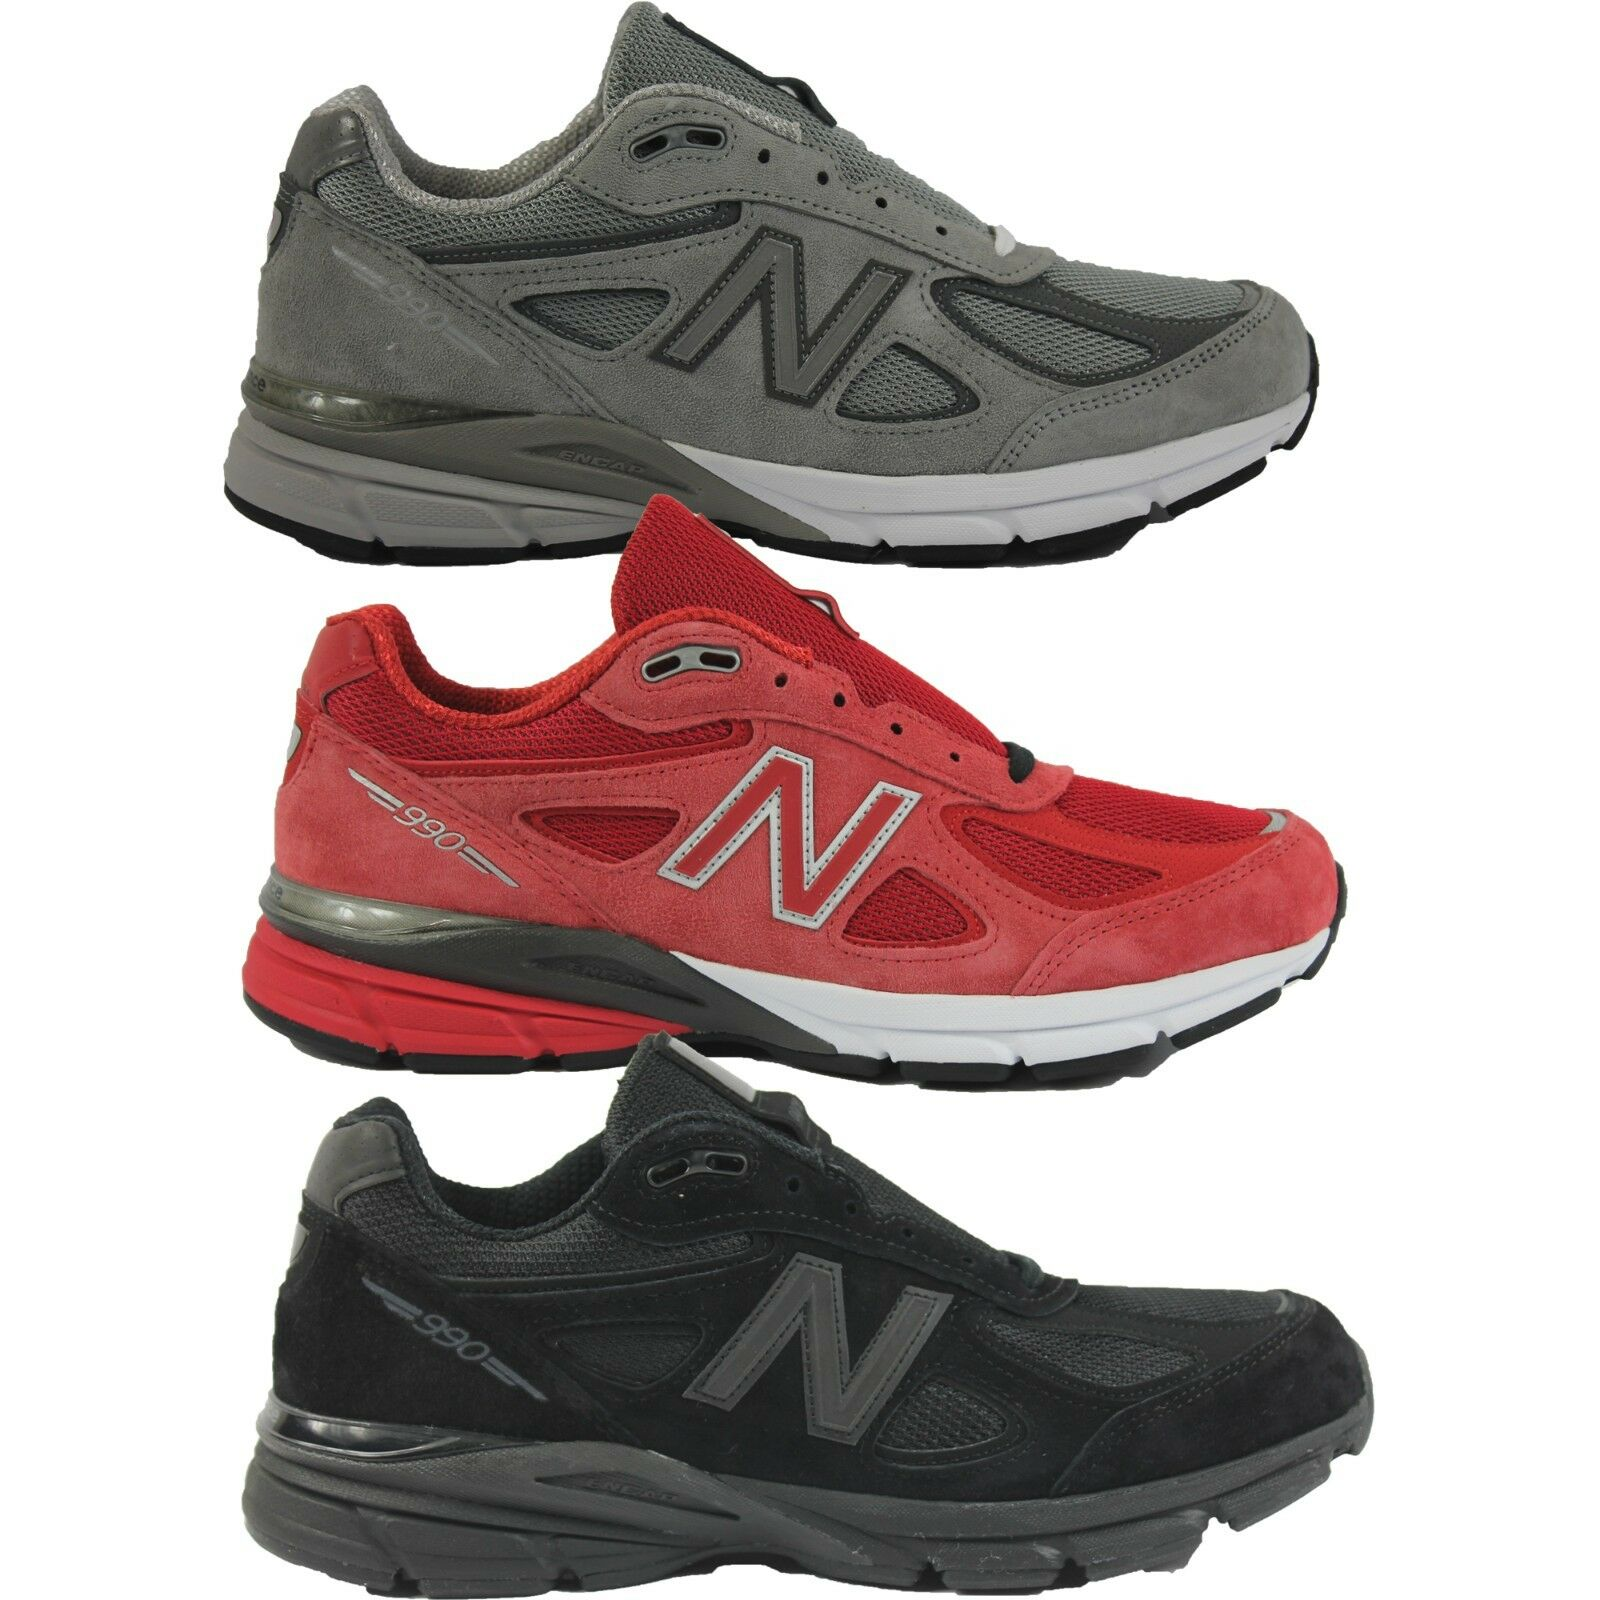 Mens New Balance M990BB4 GL4 RD4 M990v4 Premium Running shoes Sneakers USA Made